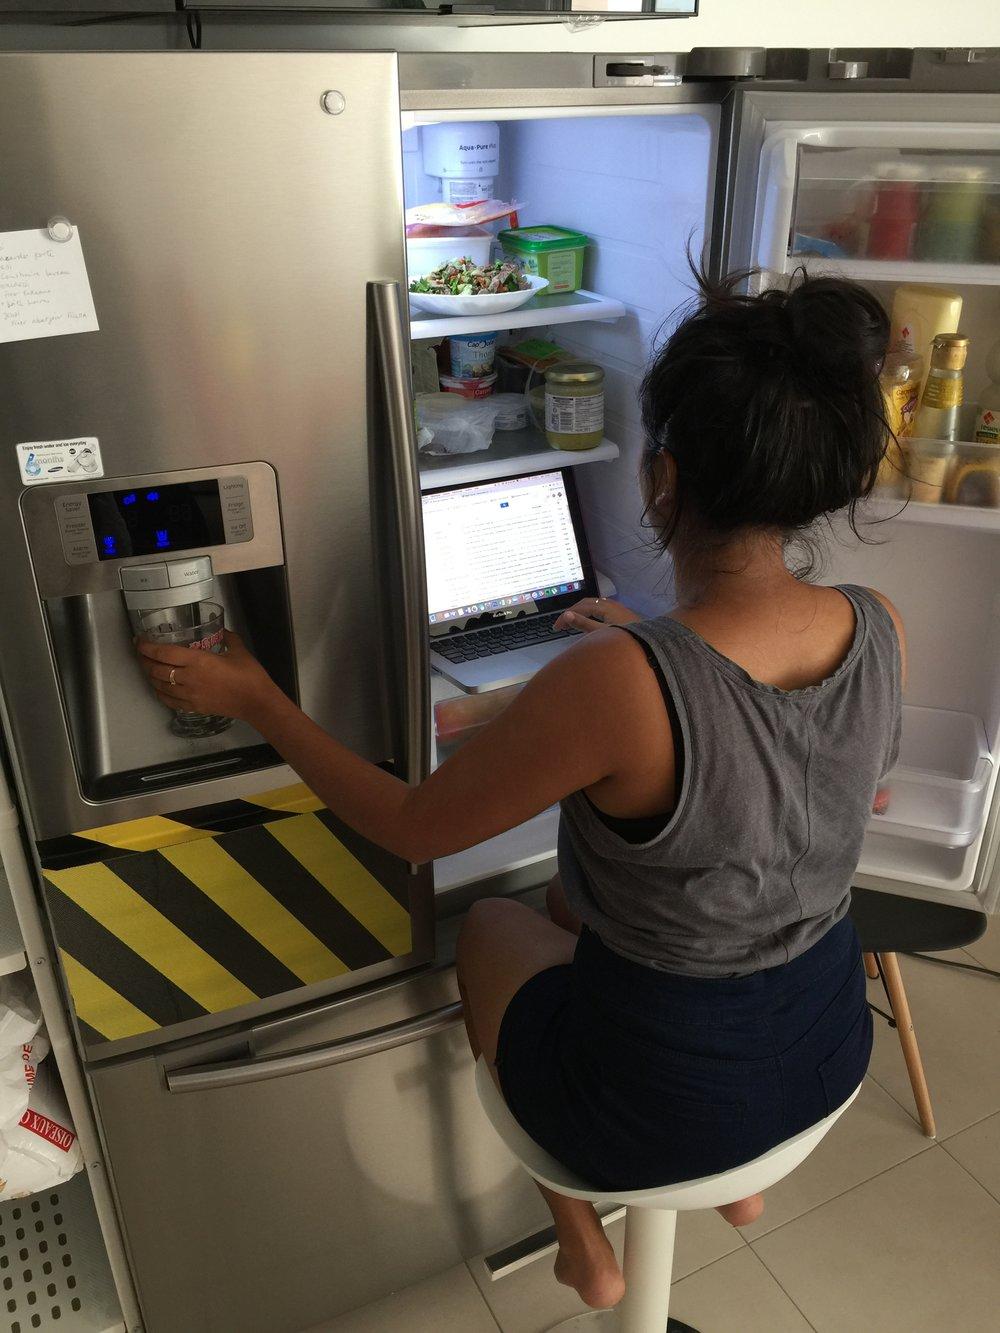 14-fridge.jpeg